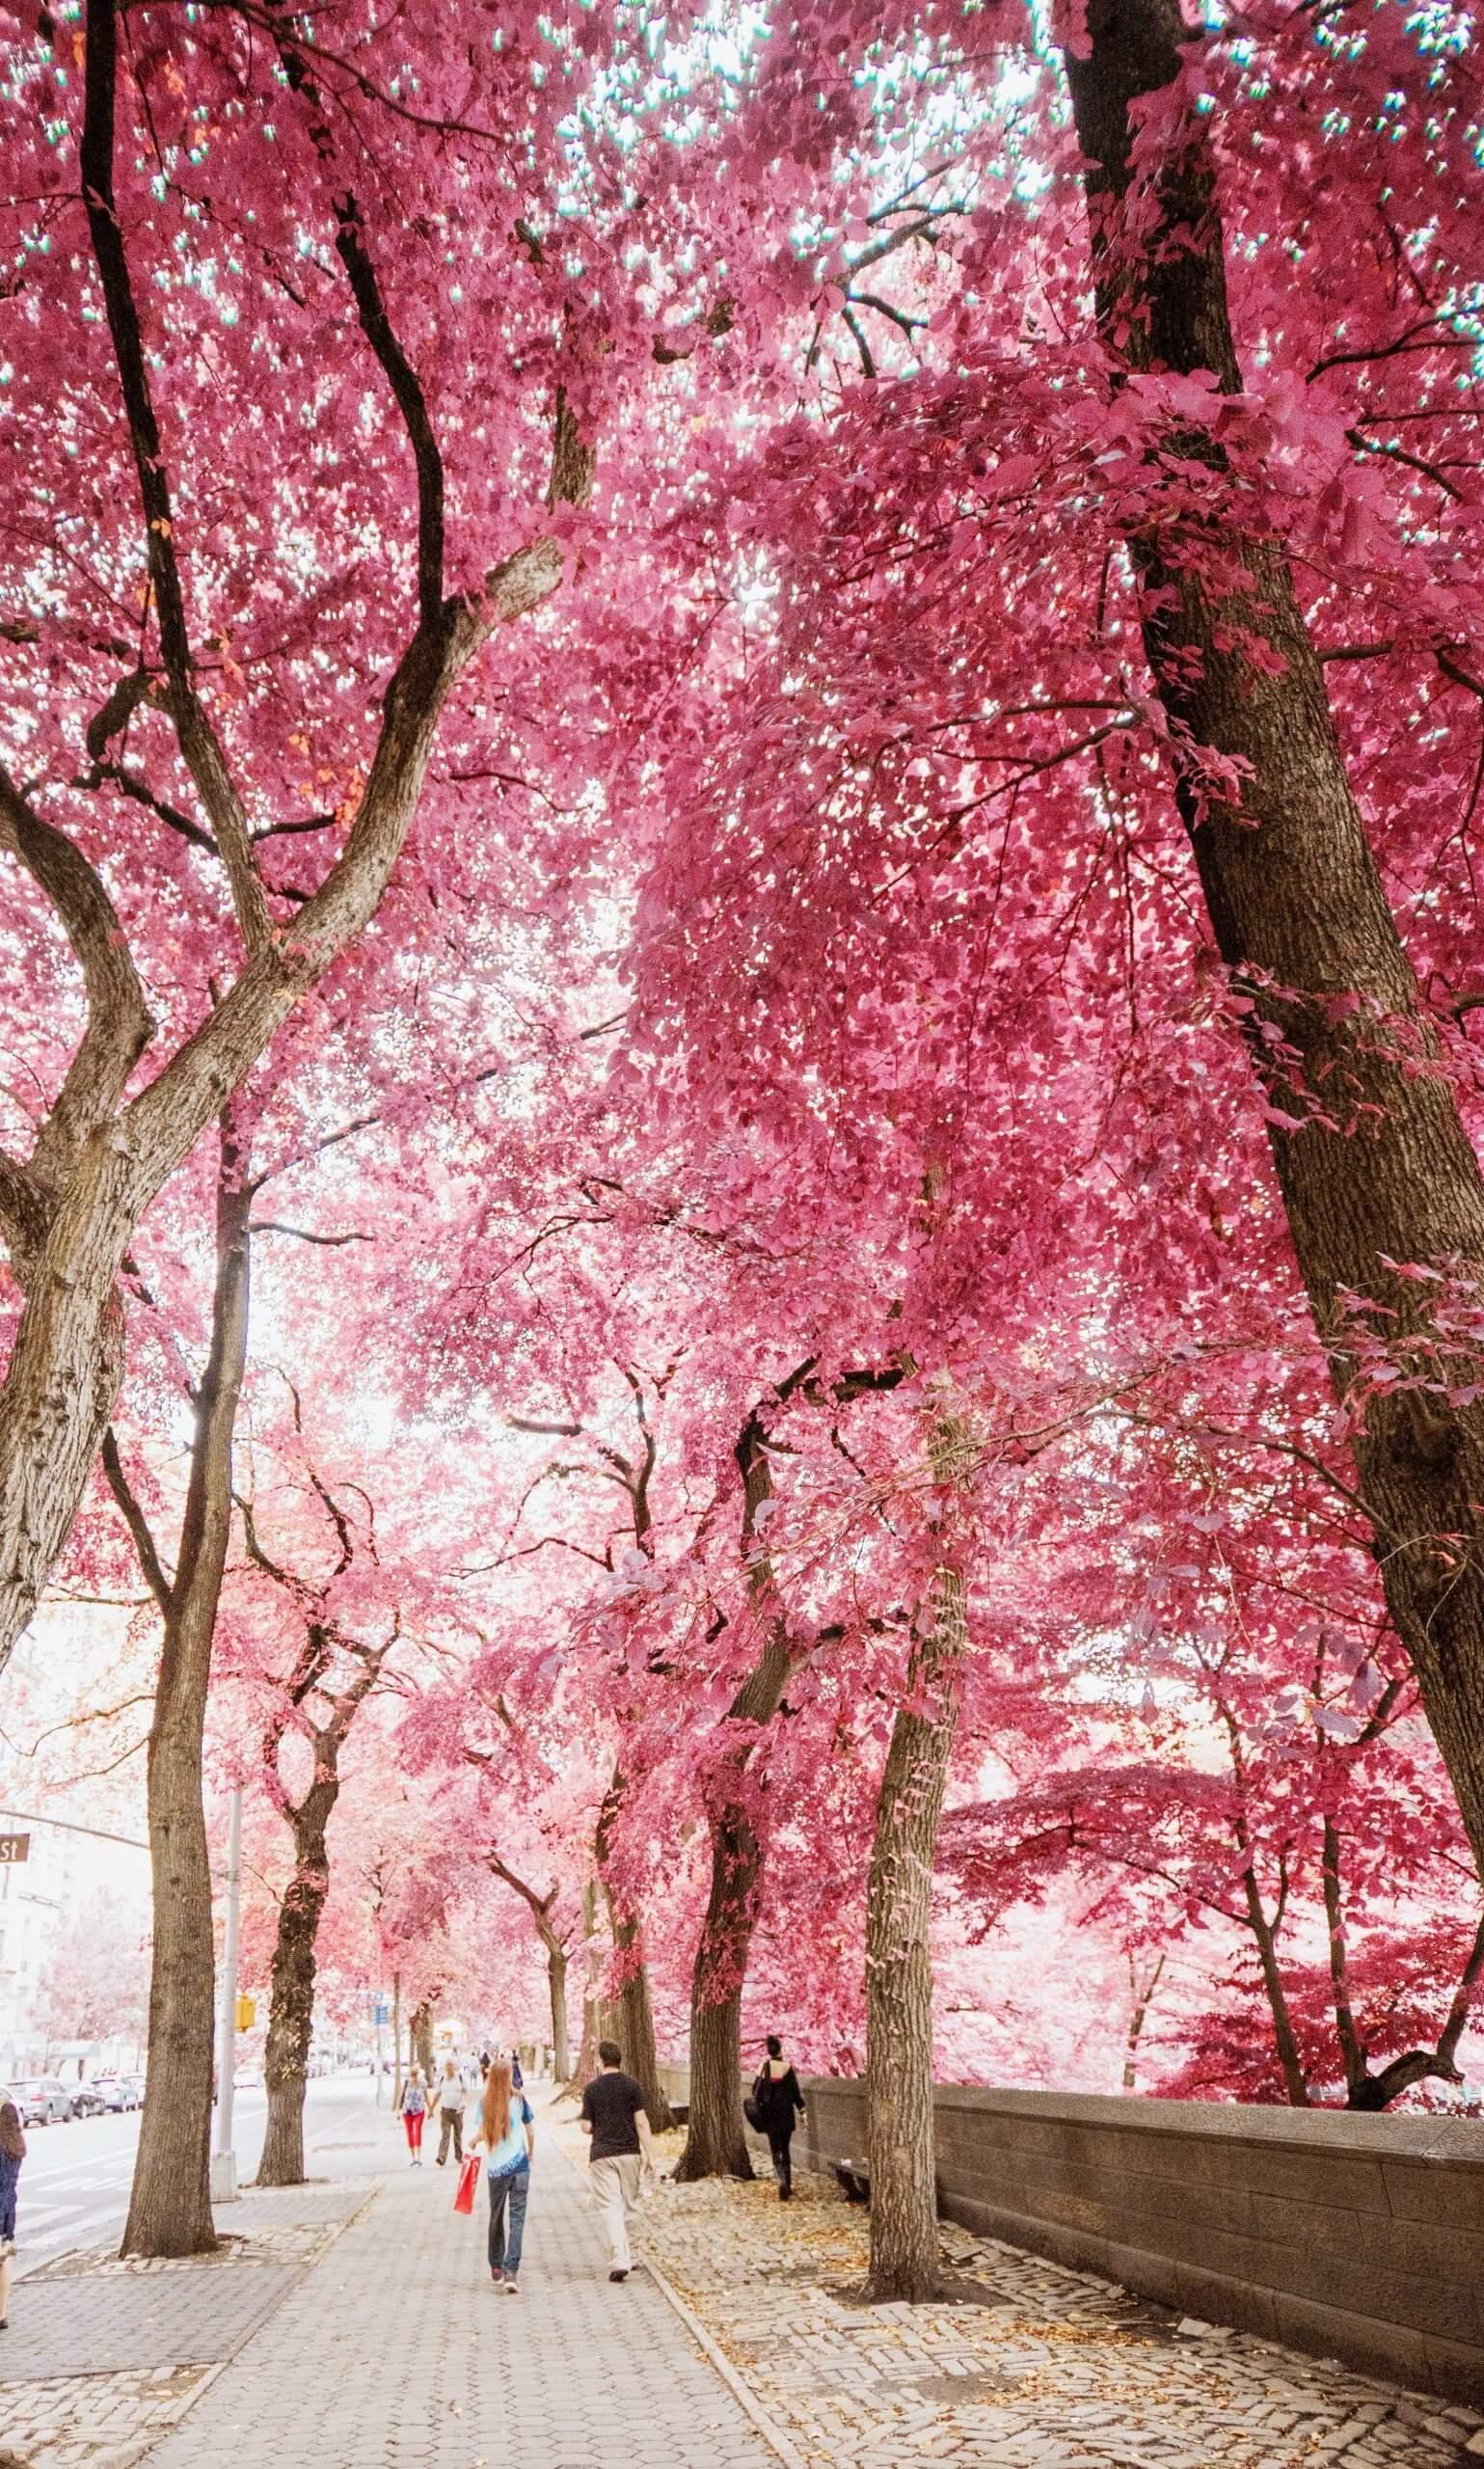 Flowering trees near a sidewalk